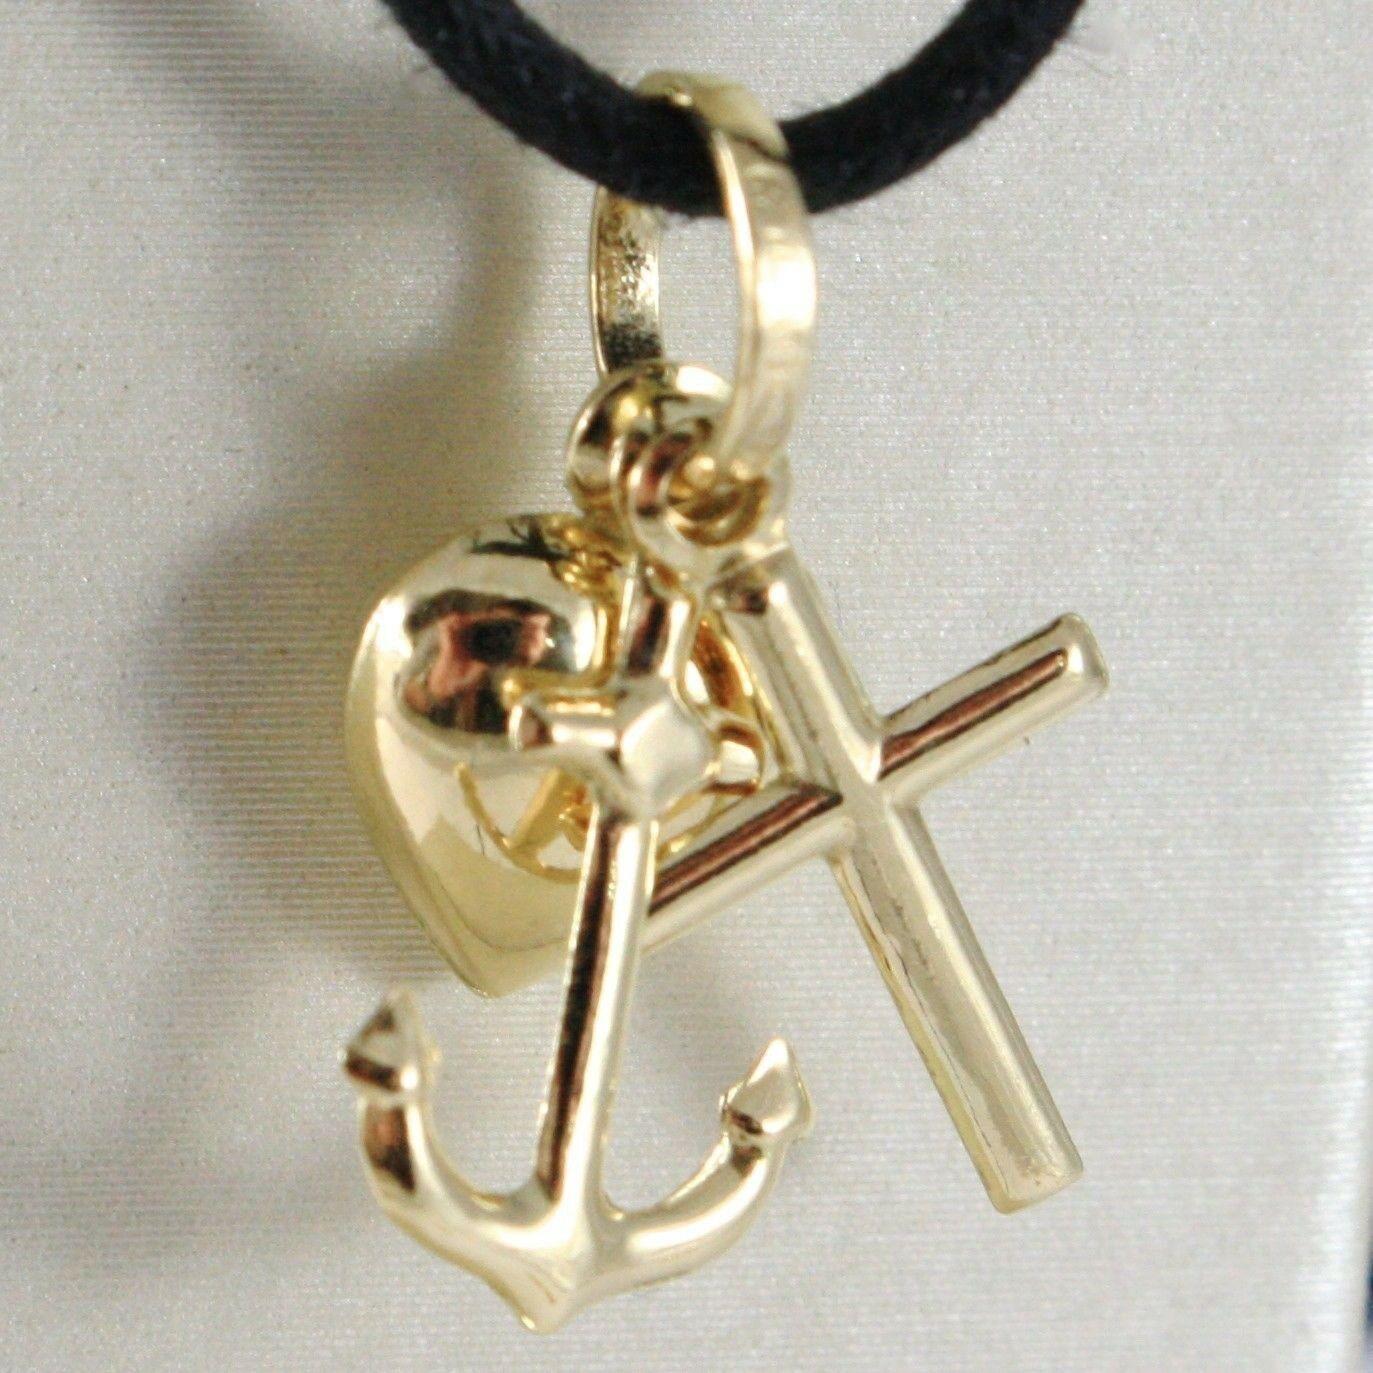 Yellow Gold Pendant or White 18K,Faith Hope Charity,cross,Heart,Anchor Shaped